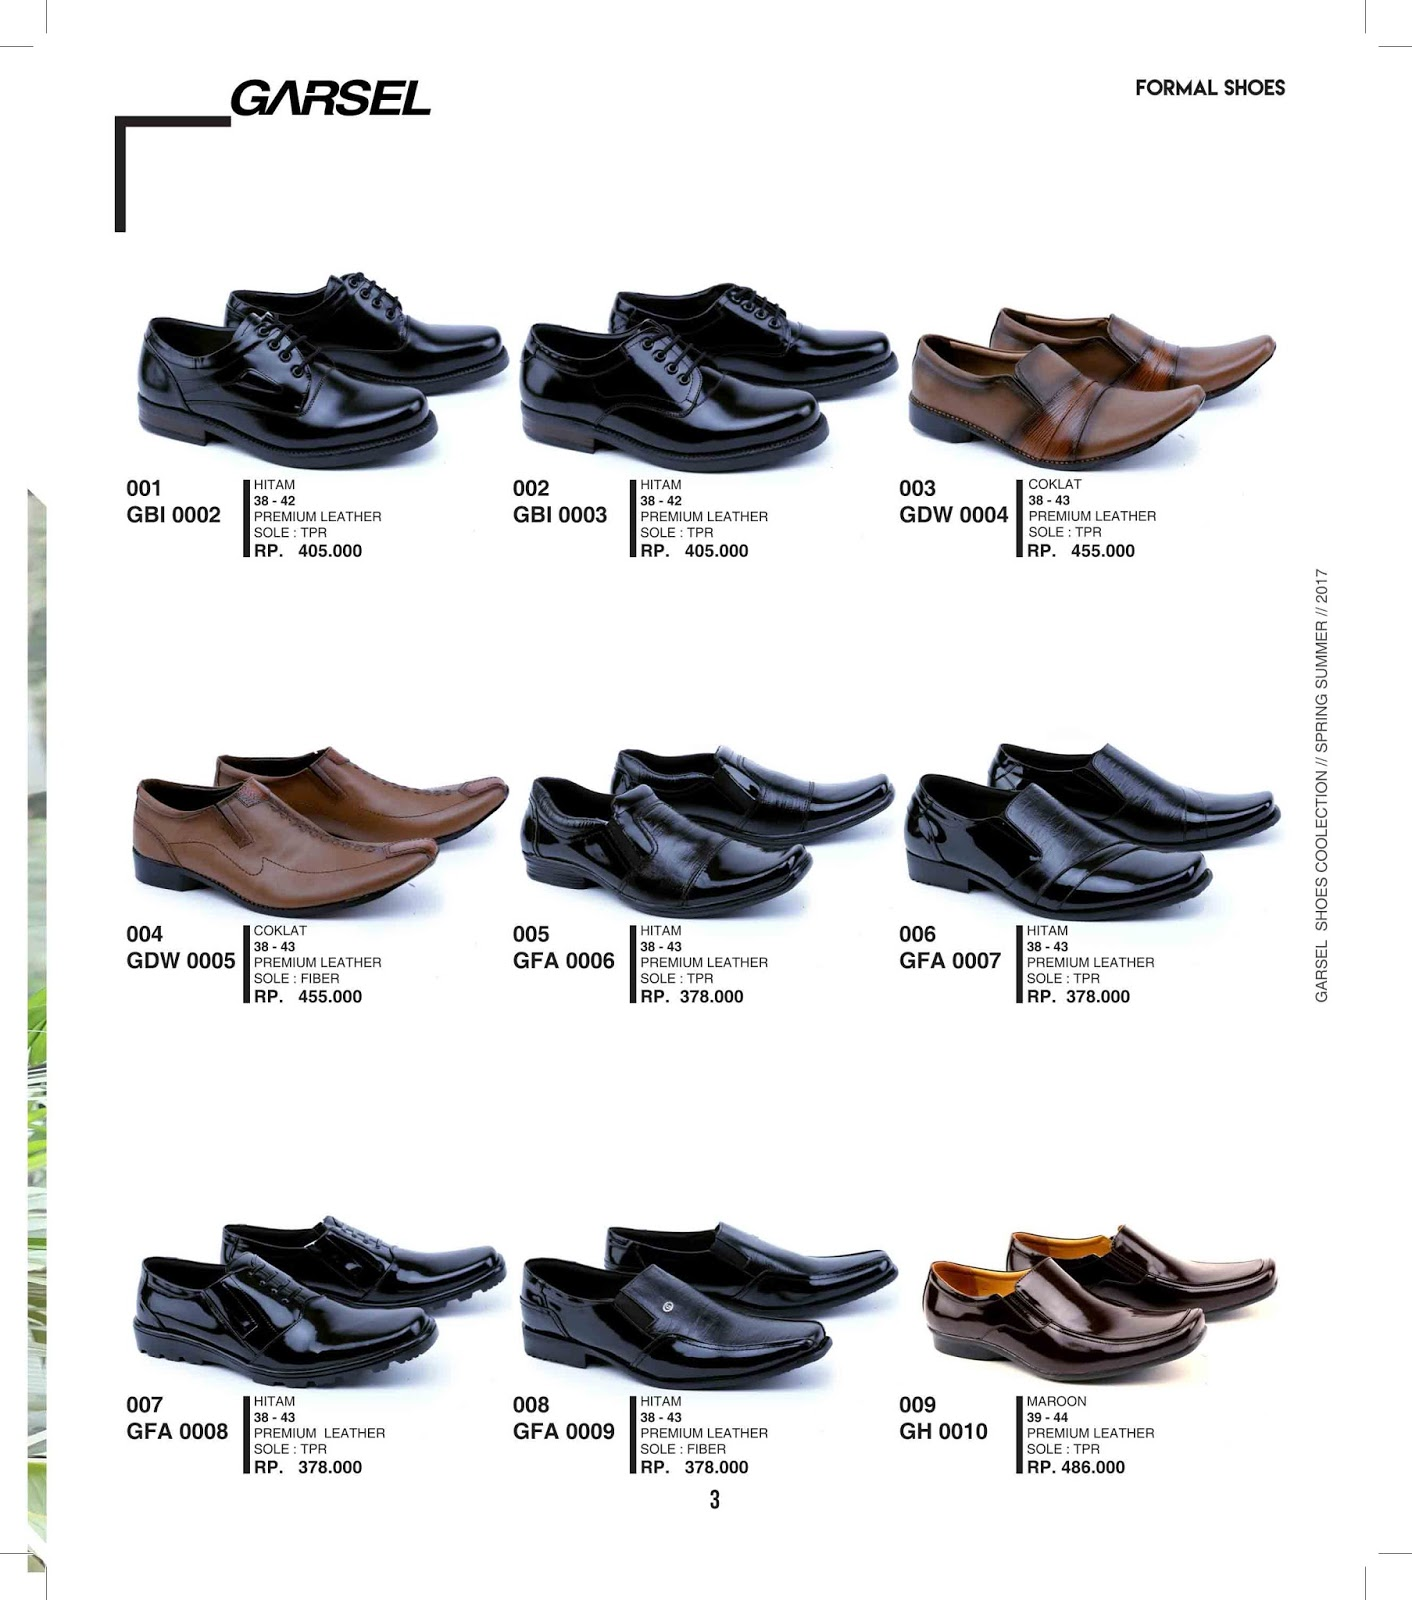 Katalog Terbaru Garsel Shoes 2017 2018 009 Tas Anak